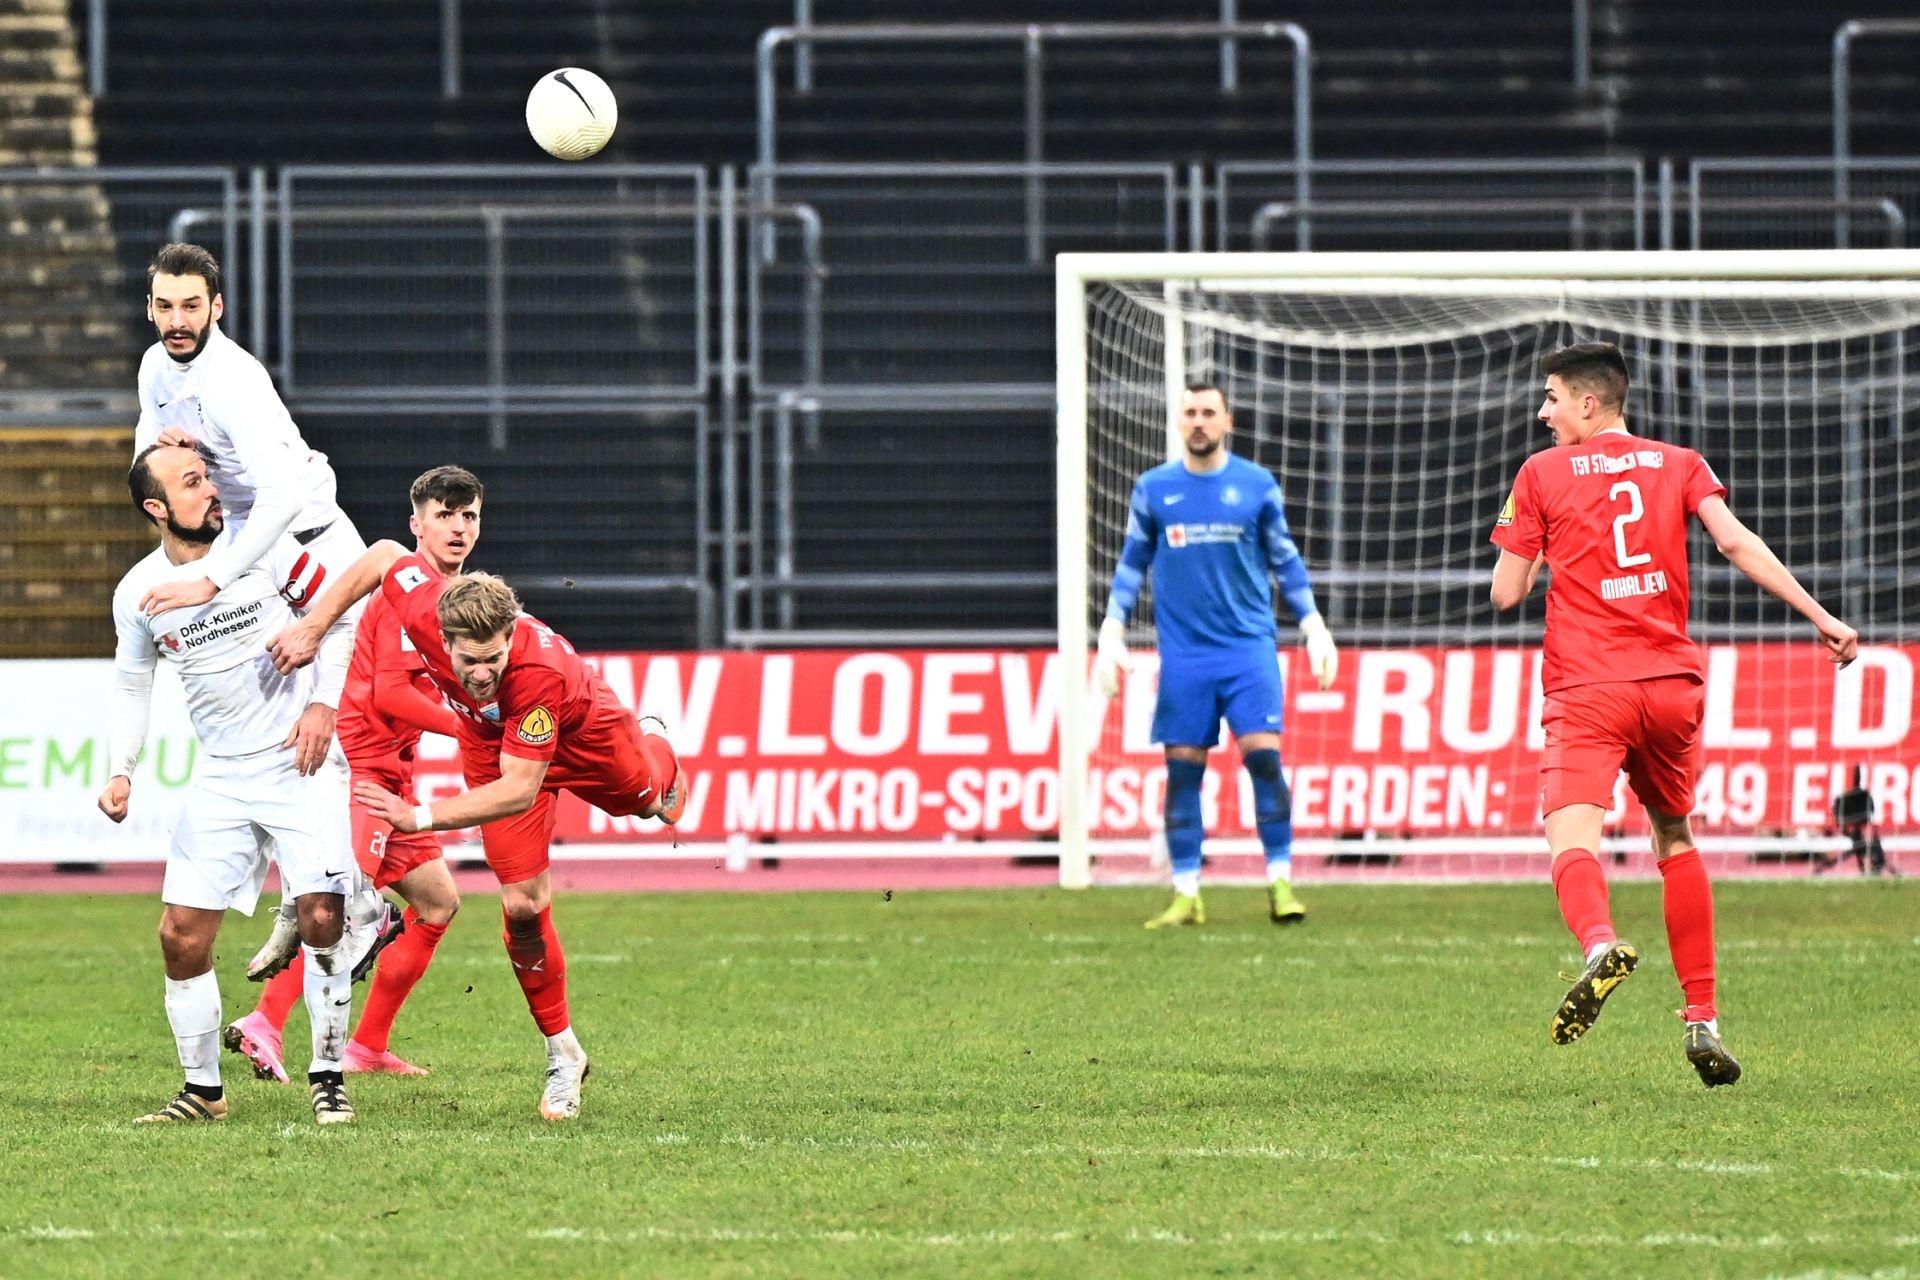 Regionalliga Südwest 2020/21, KSVHessen Kassel, TSV Steinbach Haiger, Endstand 2:1, Kevin Nennhuber, Sergej Evljuskin